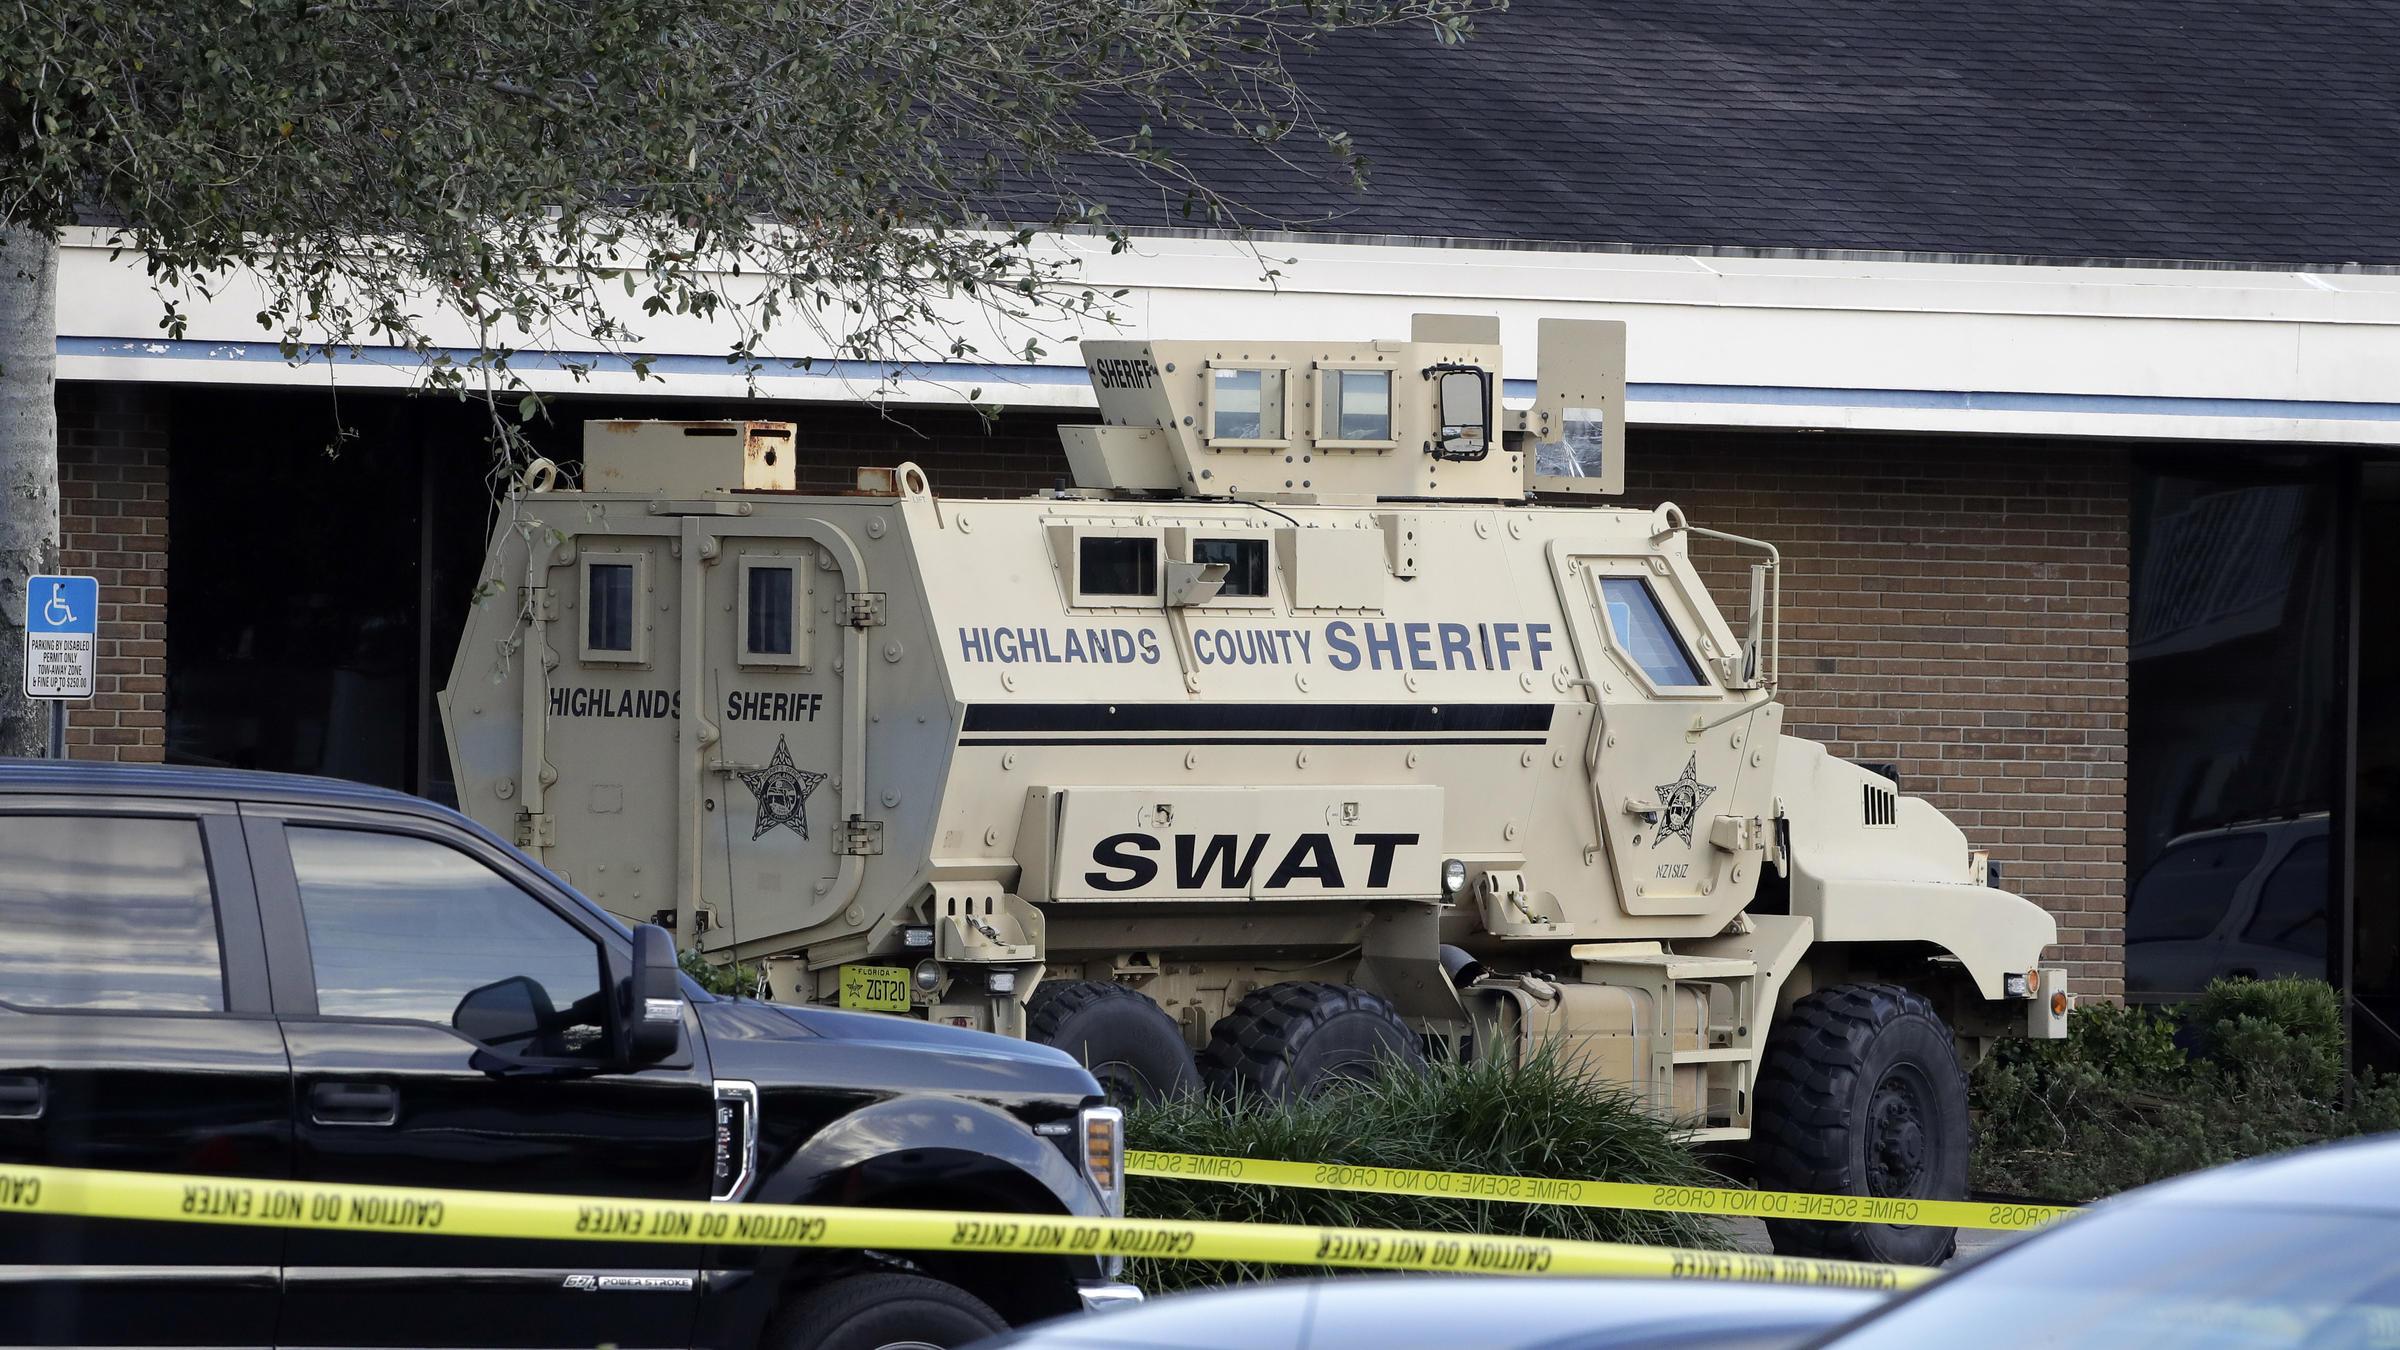 No 'true motive' for Florida bank rampage